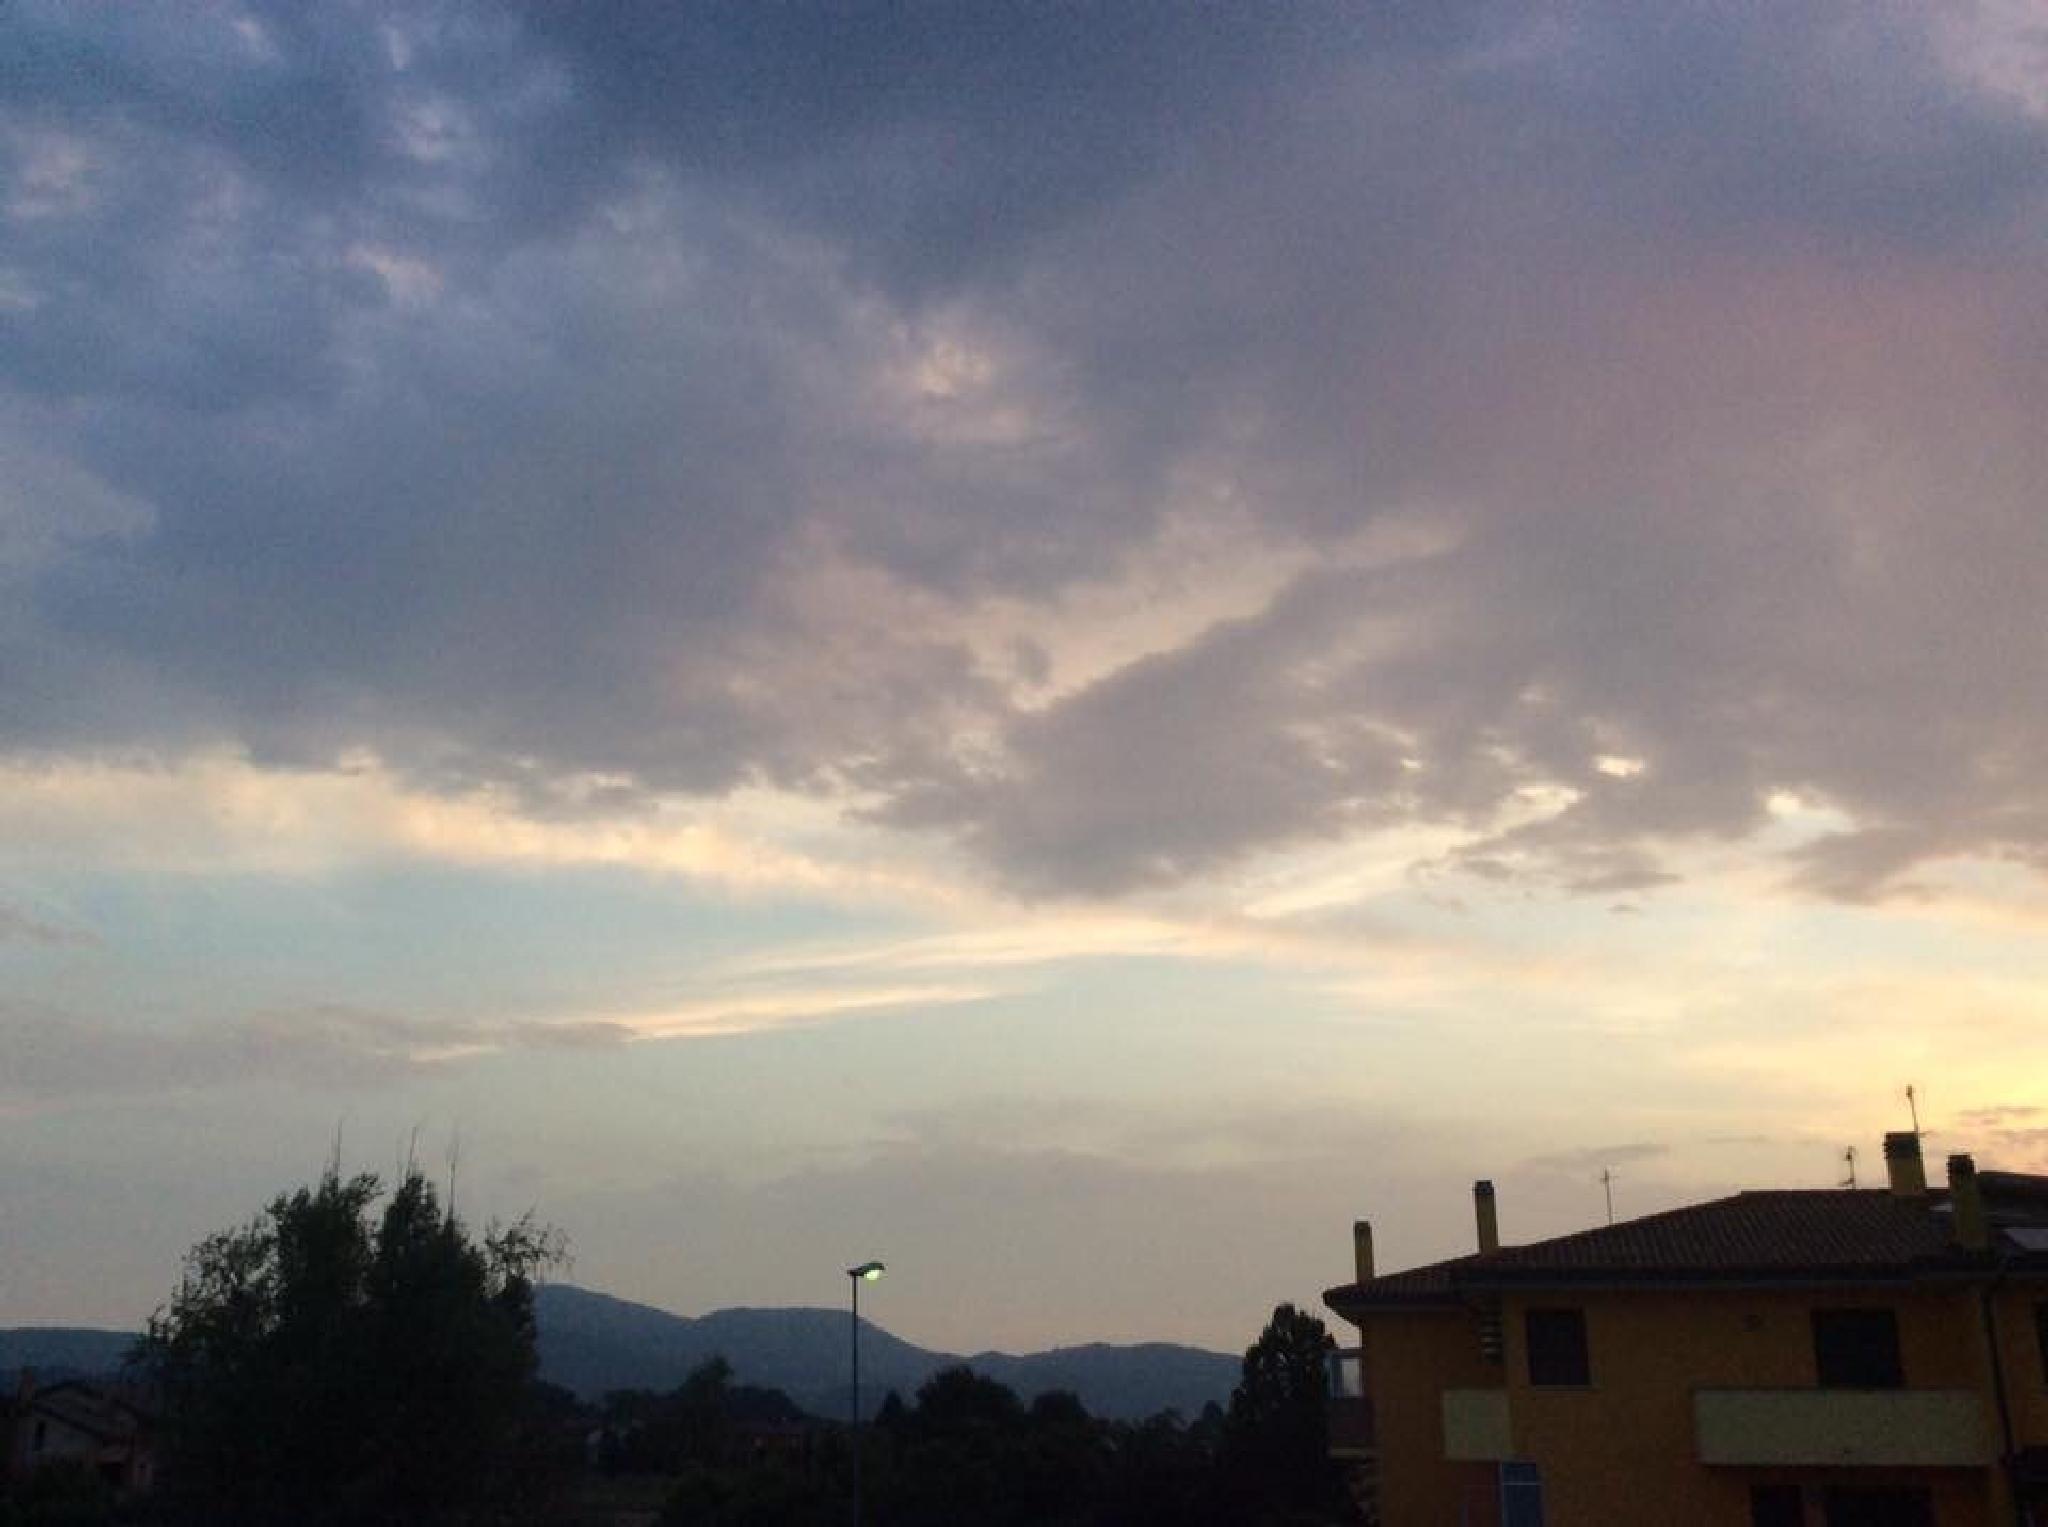 My Summer evening by kkartodinudjo